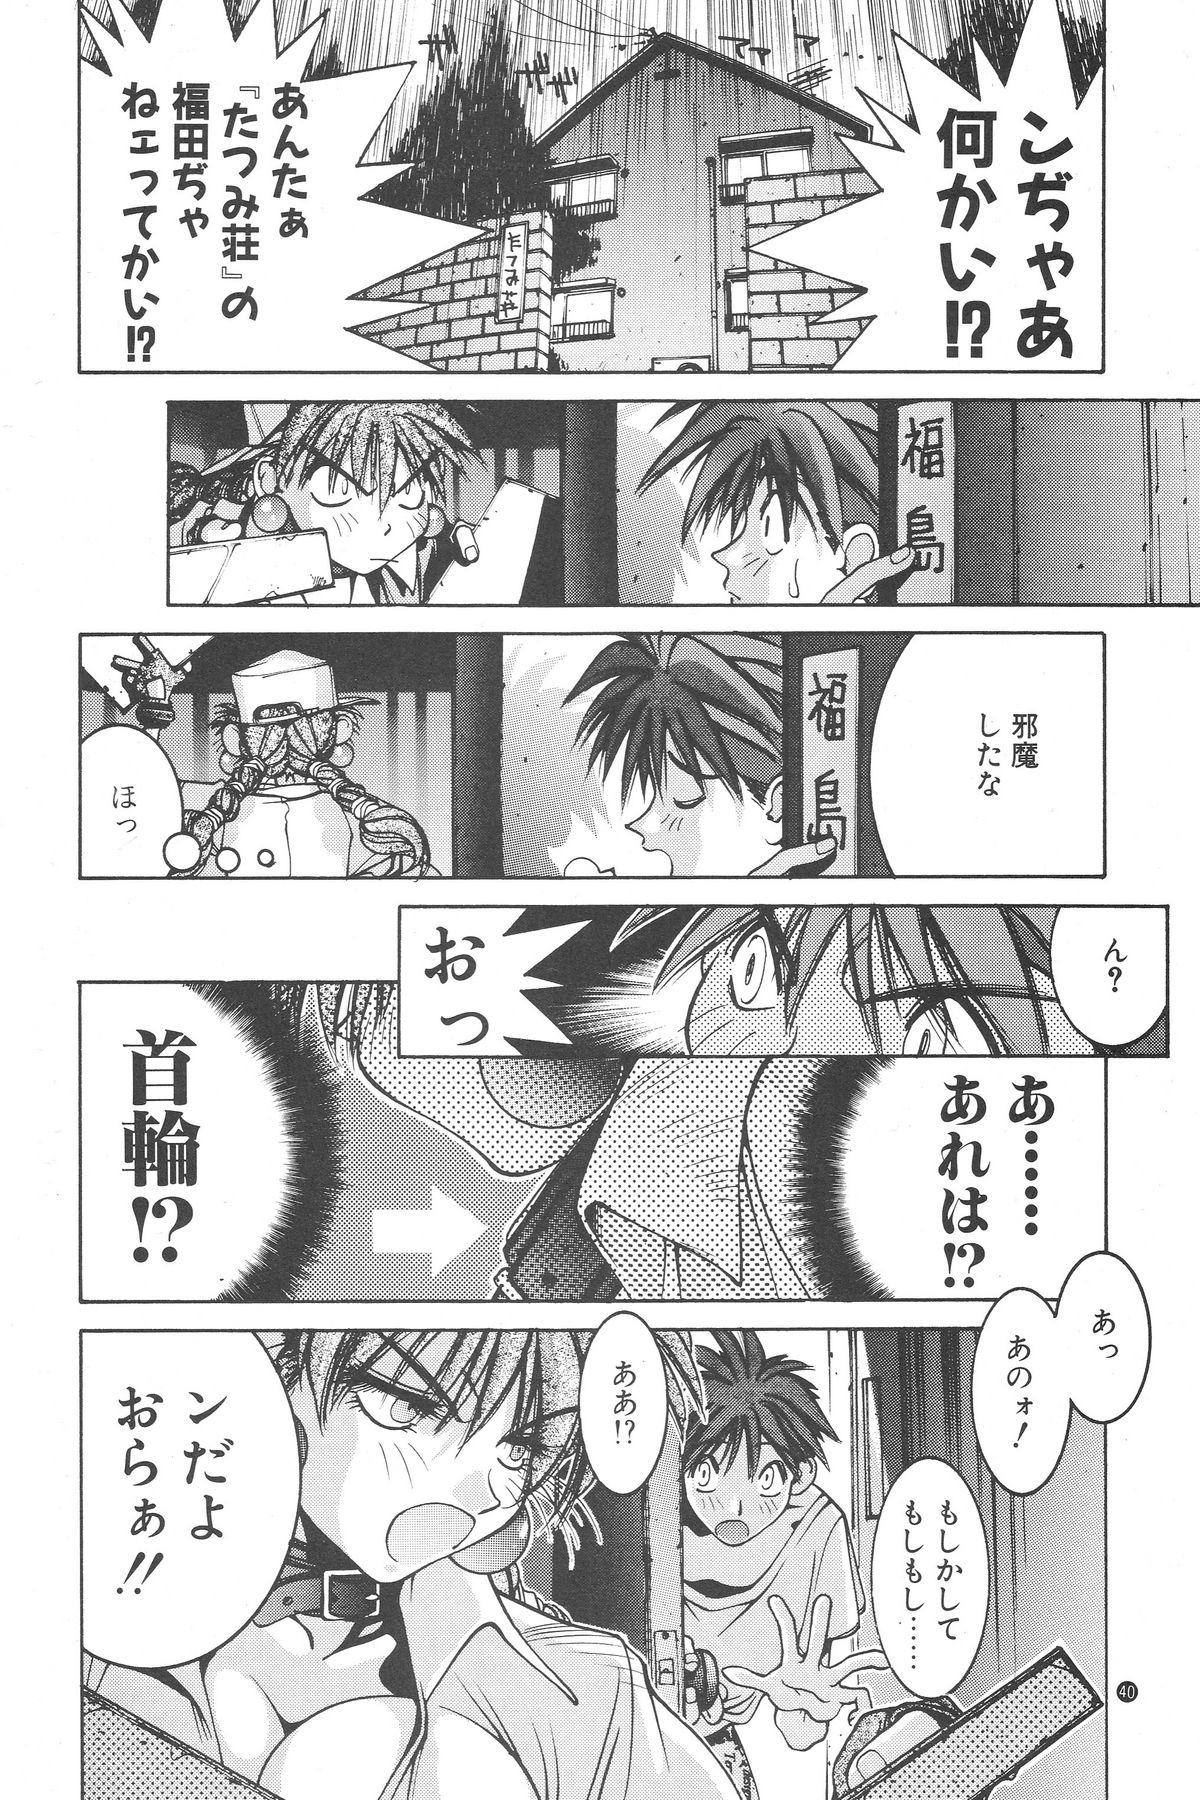 Nori-Haru 37